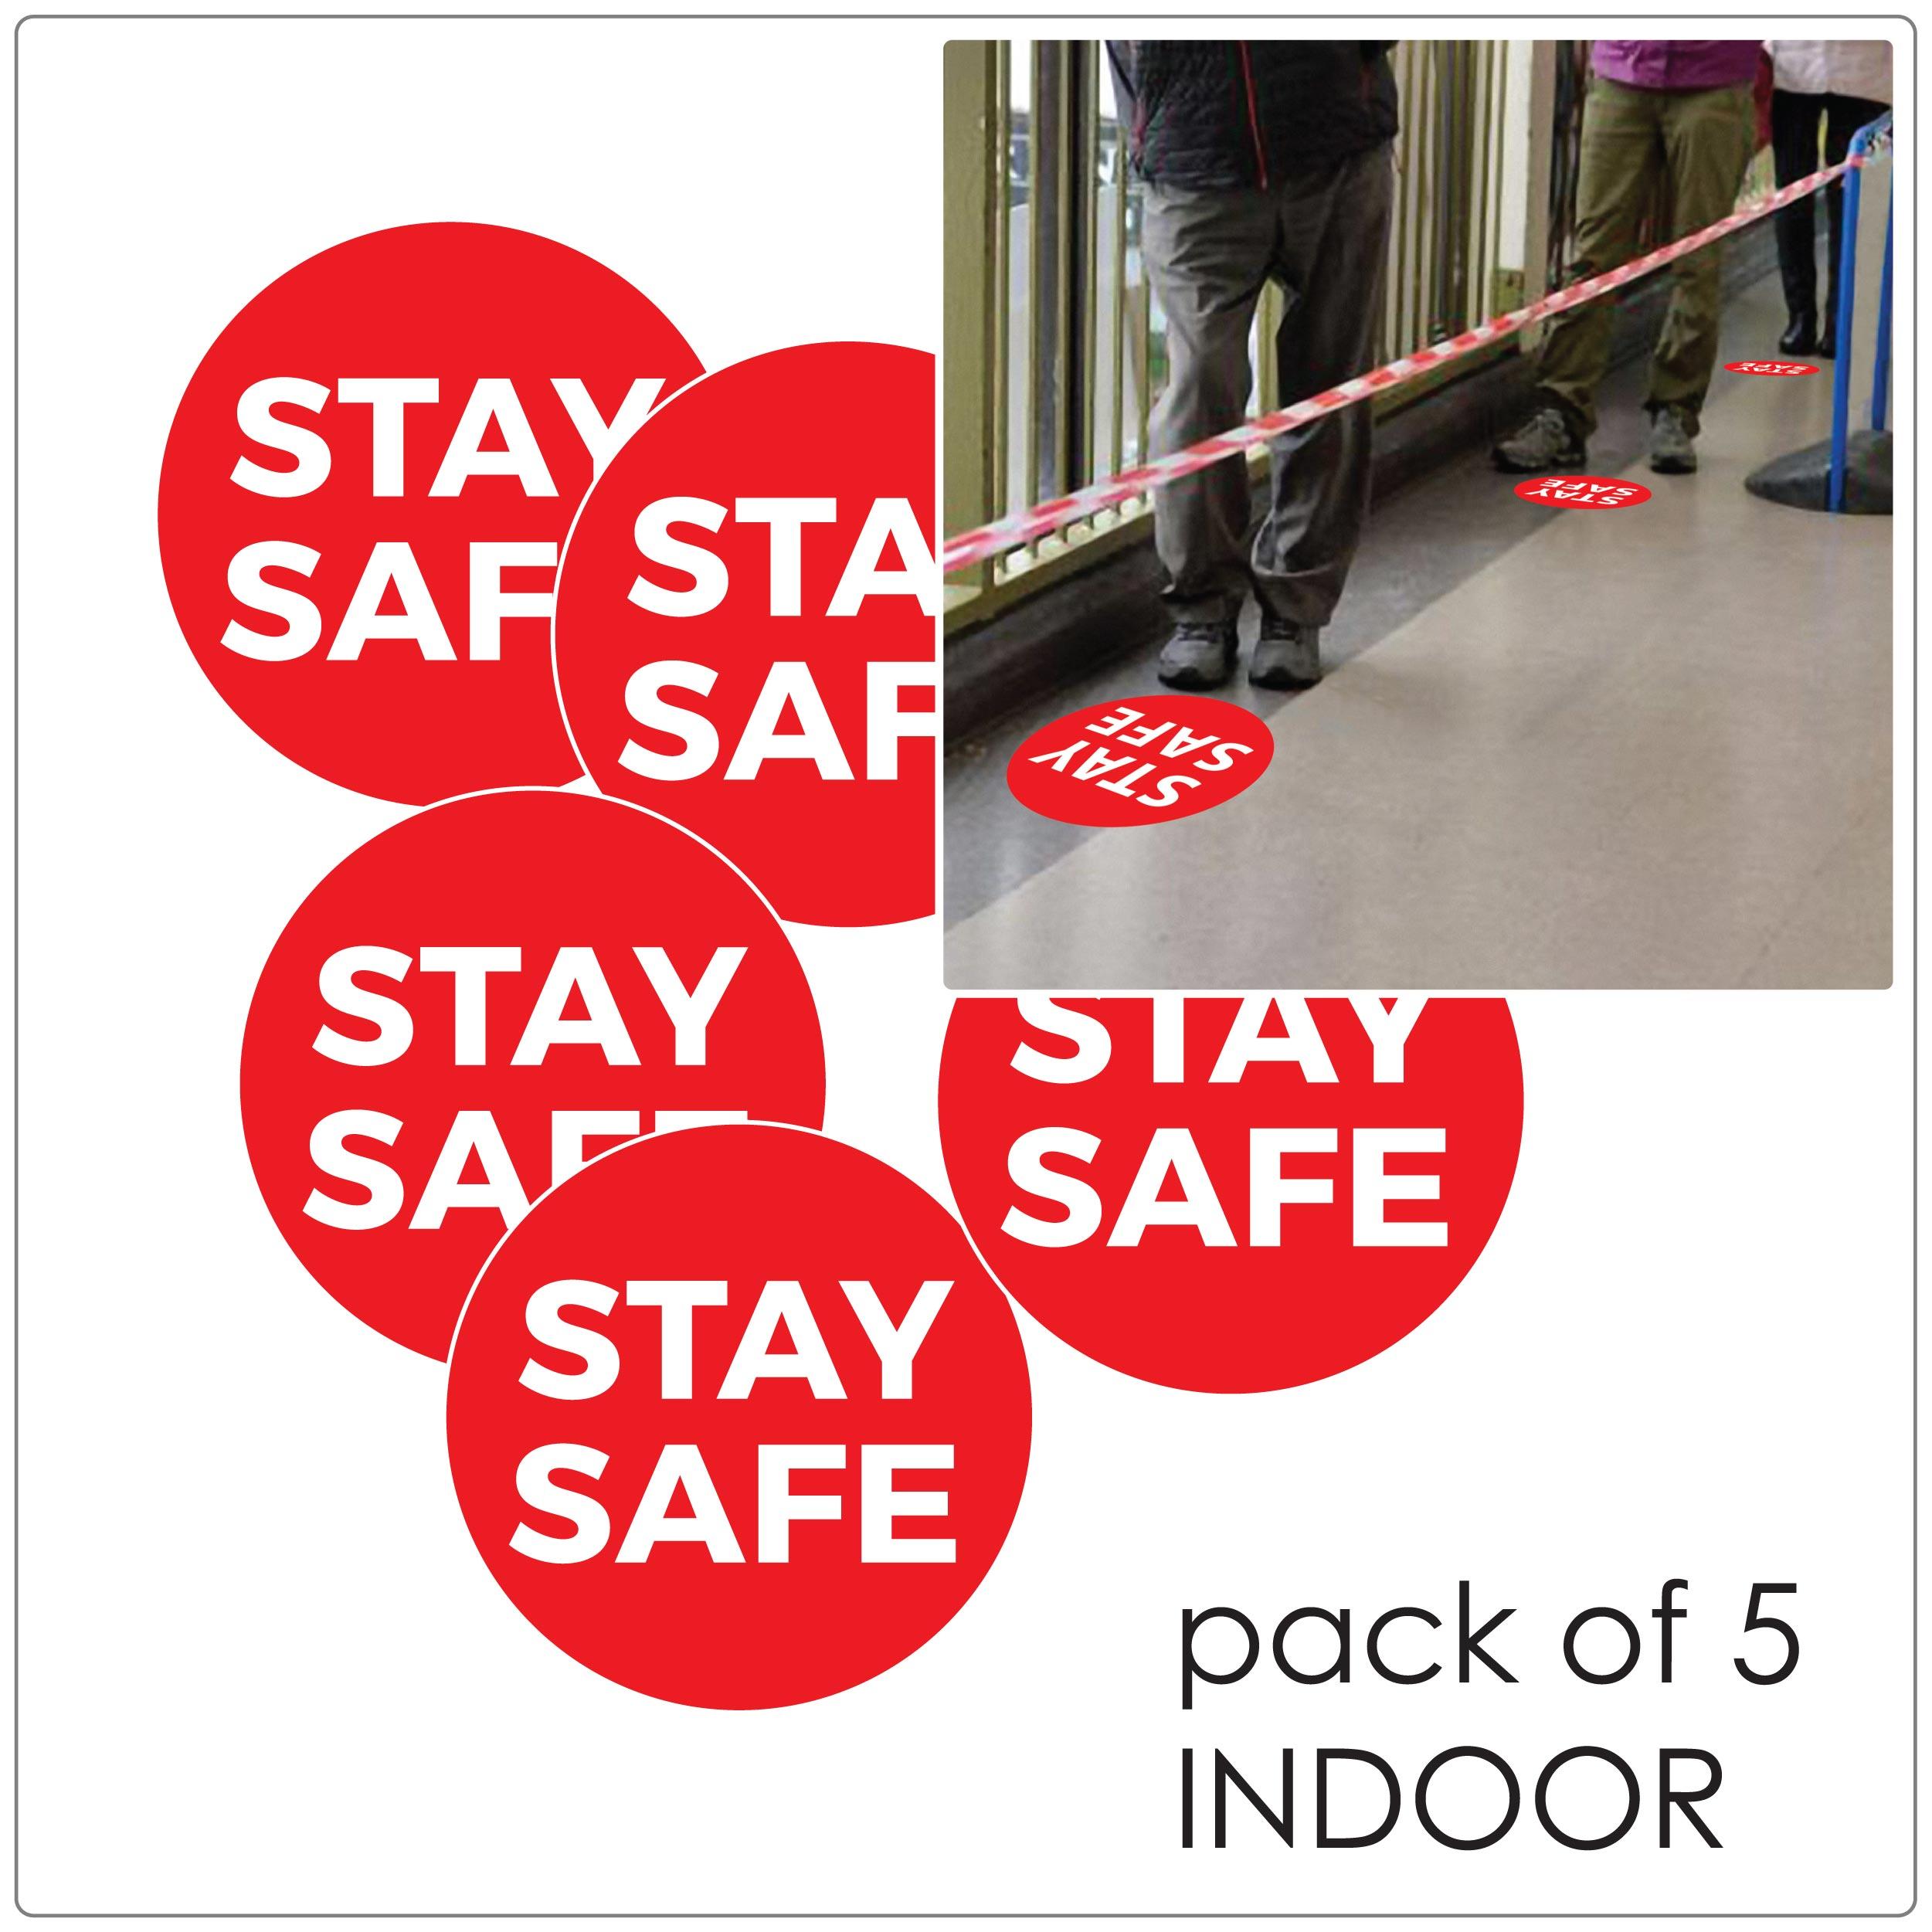 COVID-19 social distancing indoor floor sticker